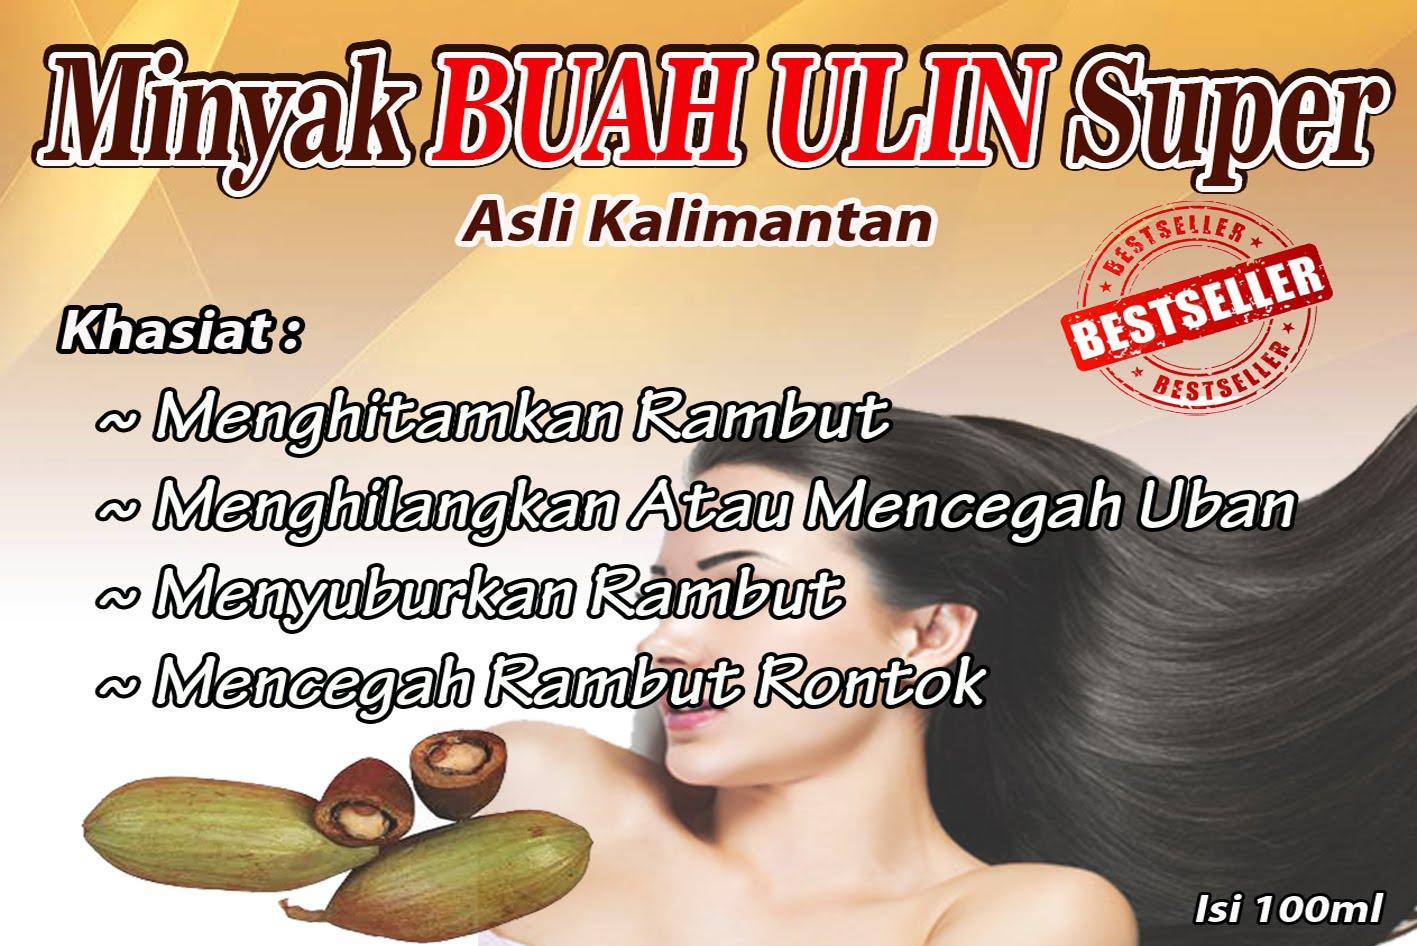 khasiat buah ulin